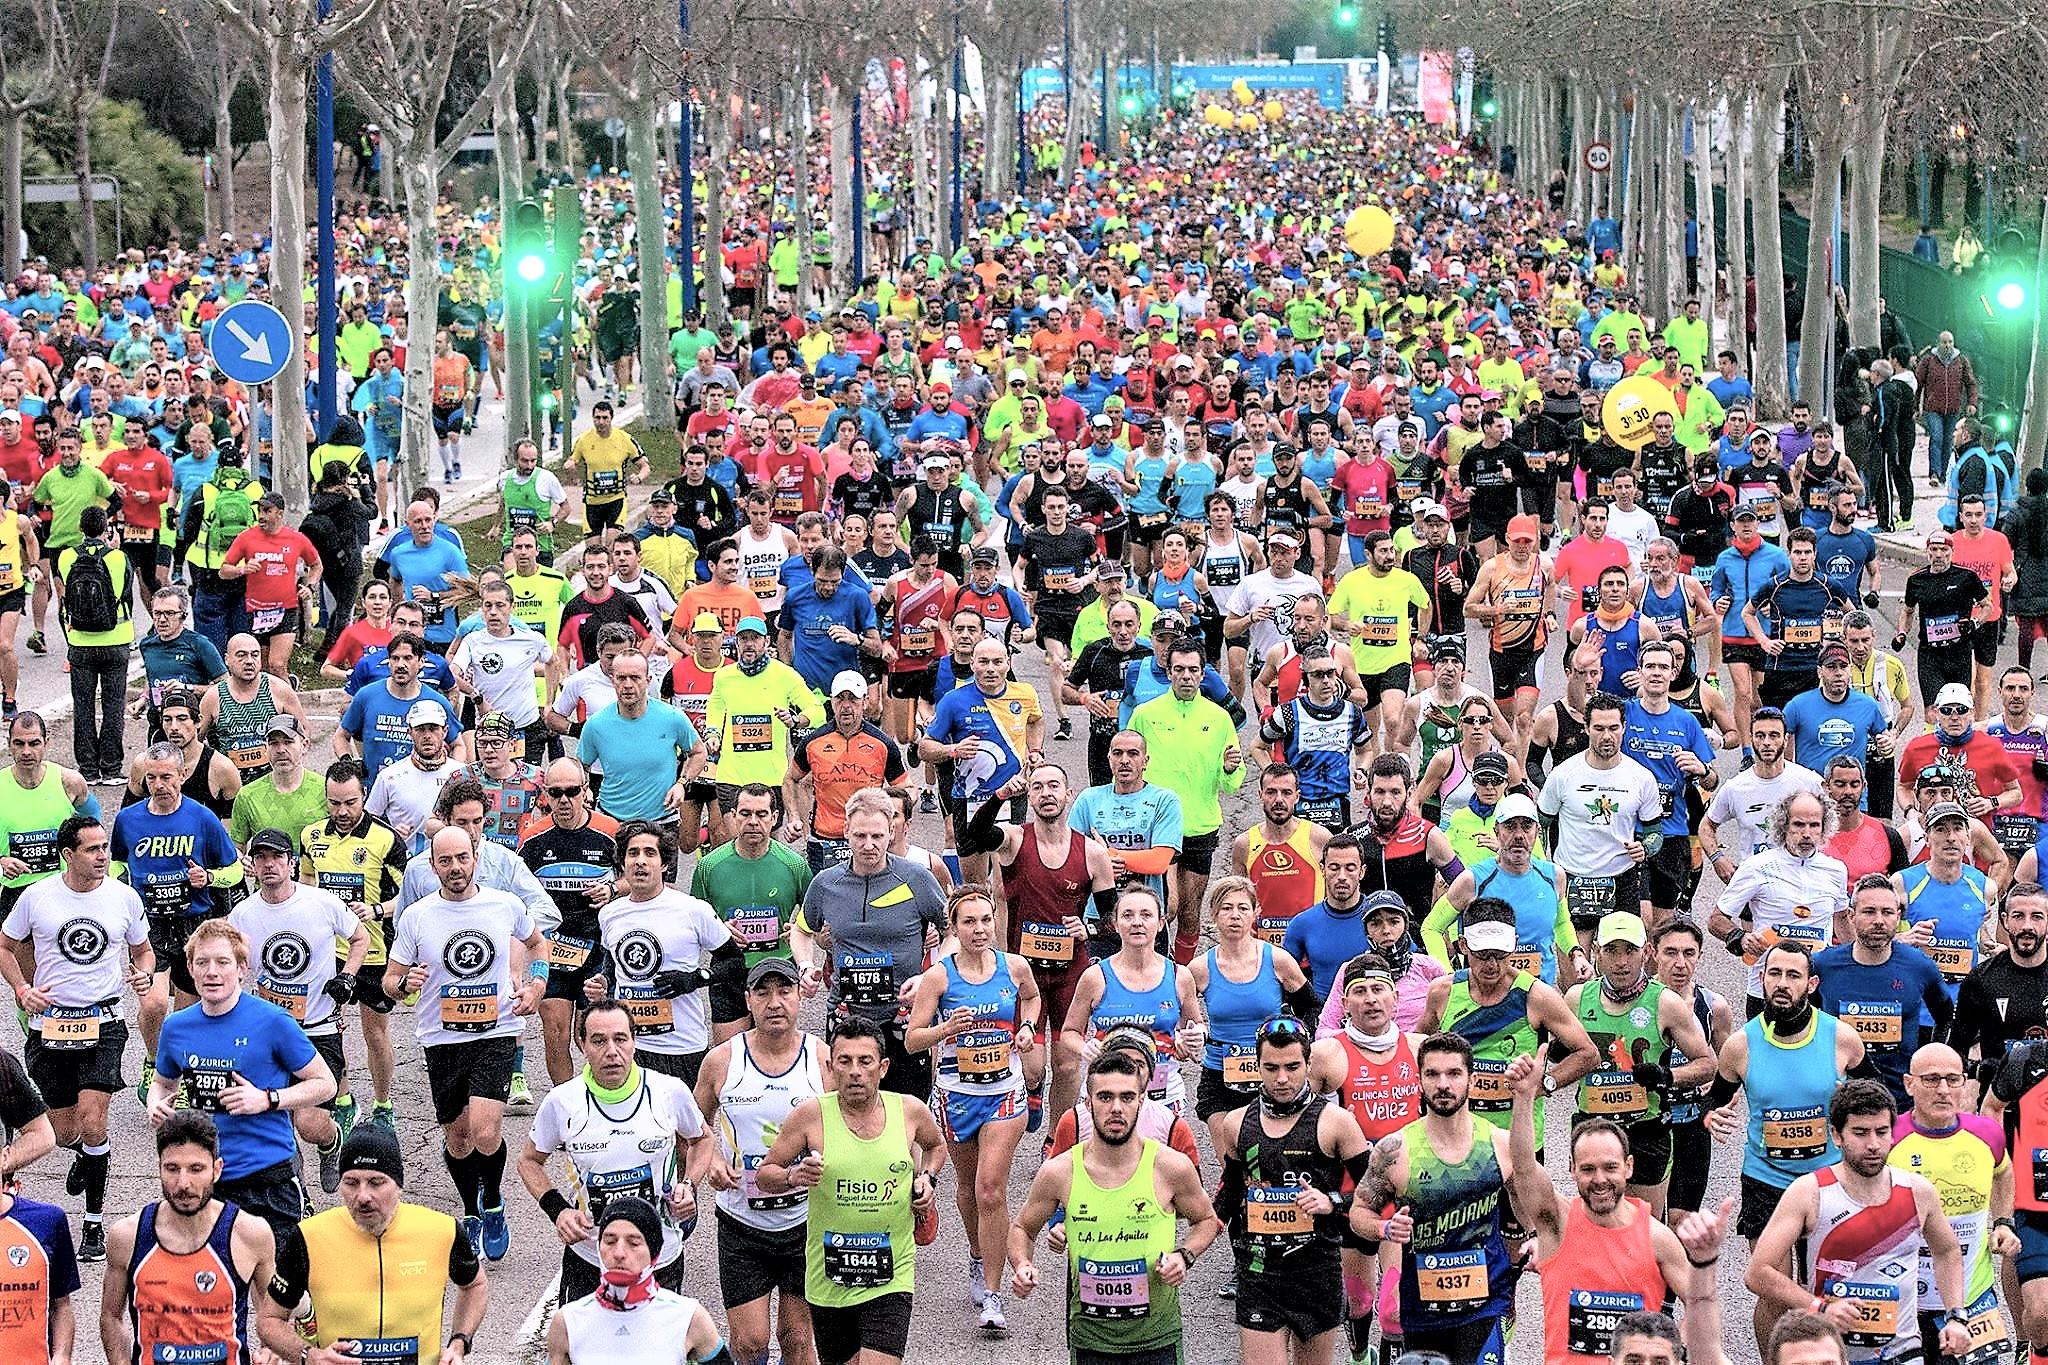 Maratón Sevilla 2.017: Paula Gonzalez Berodia firma el doblete y Erikus Titus bate record carrera. Meta 10.119 finalistas.